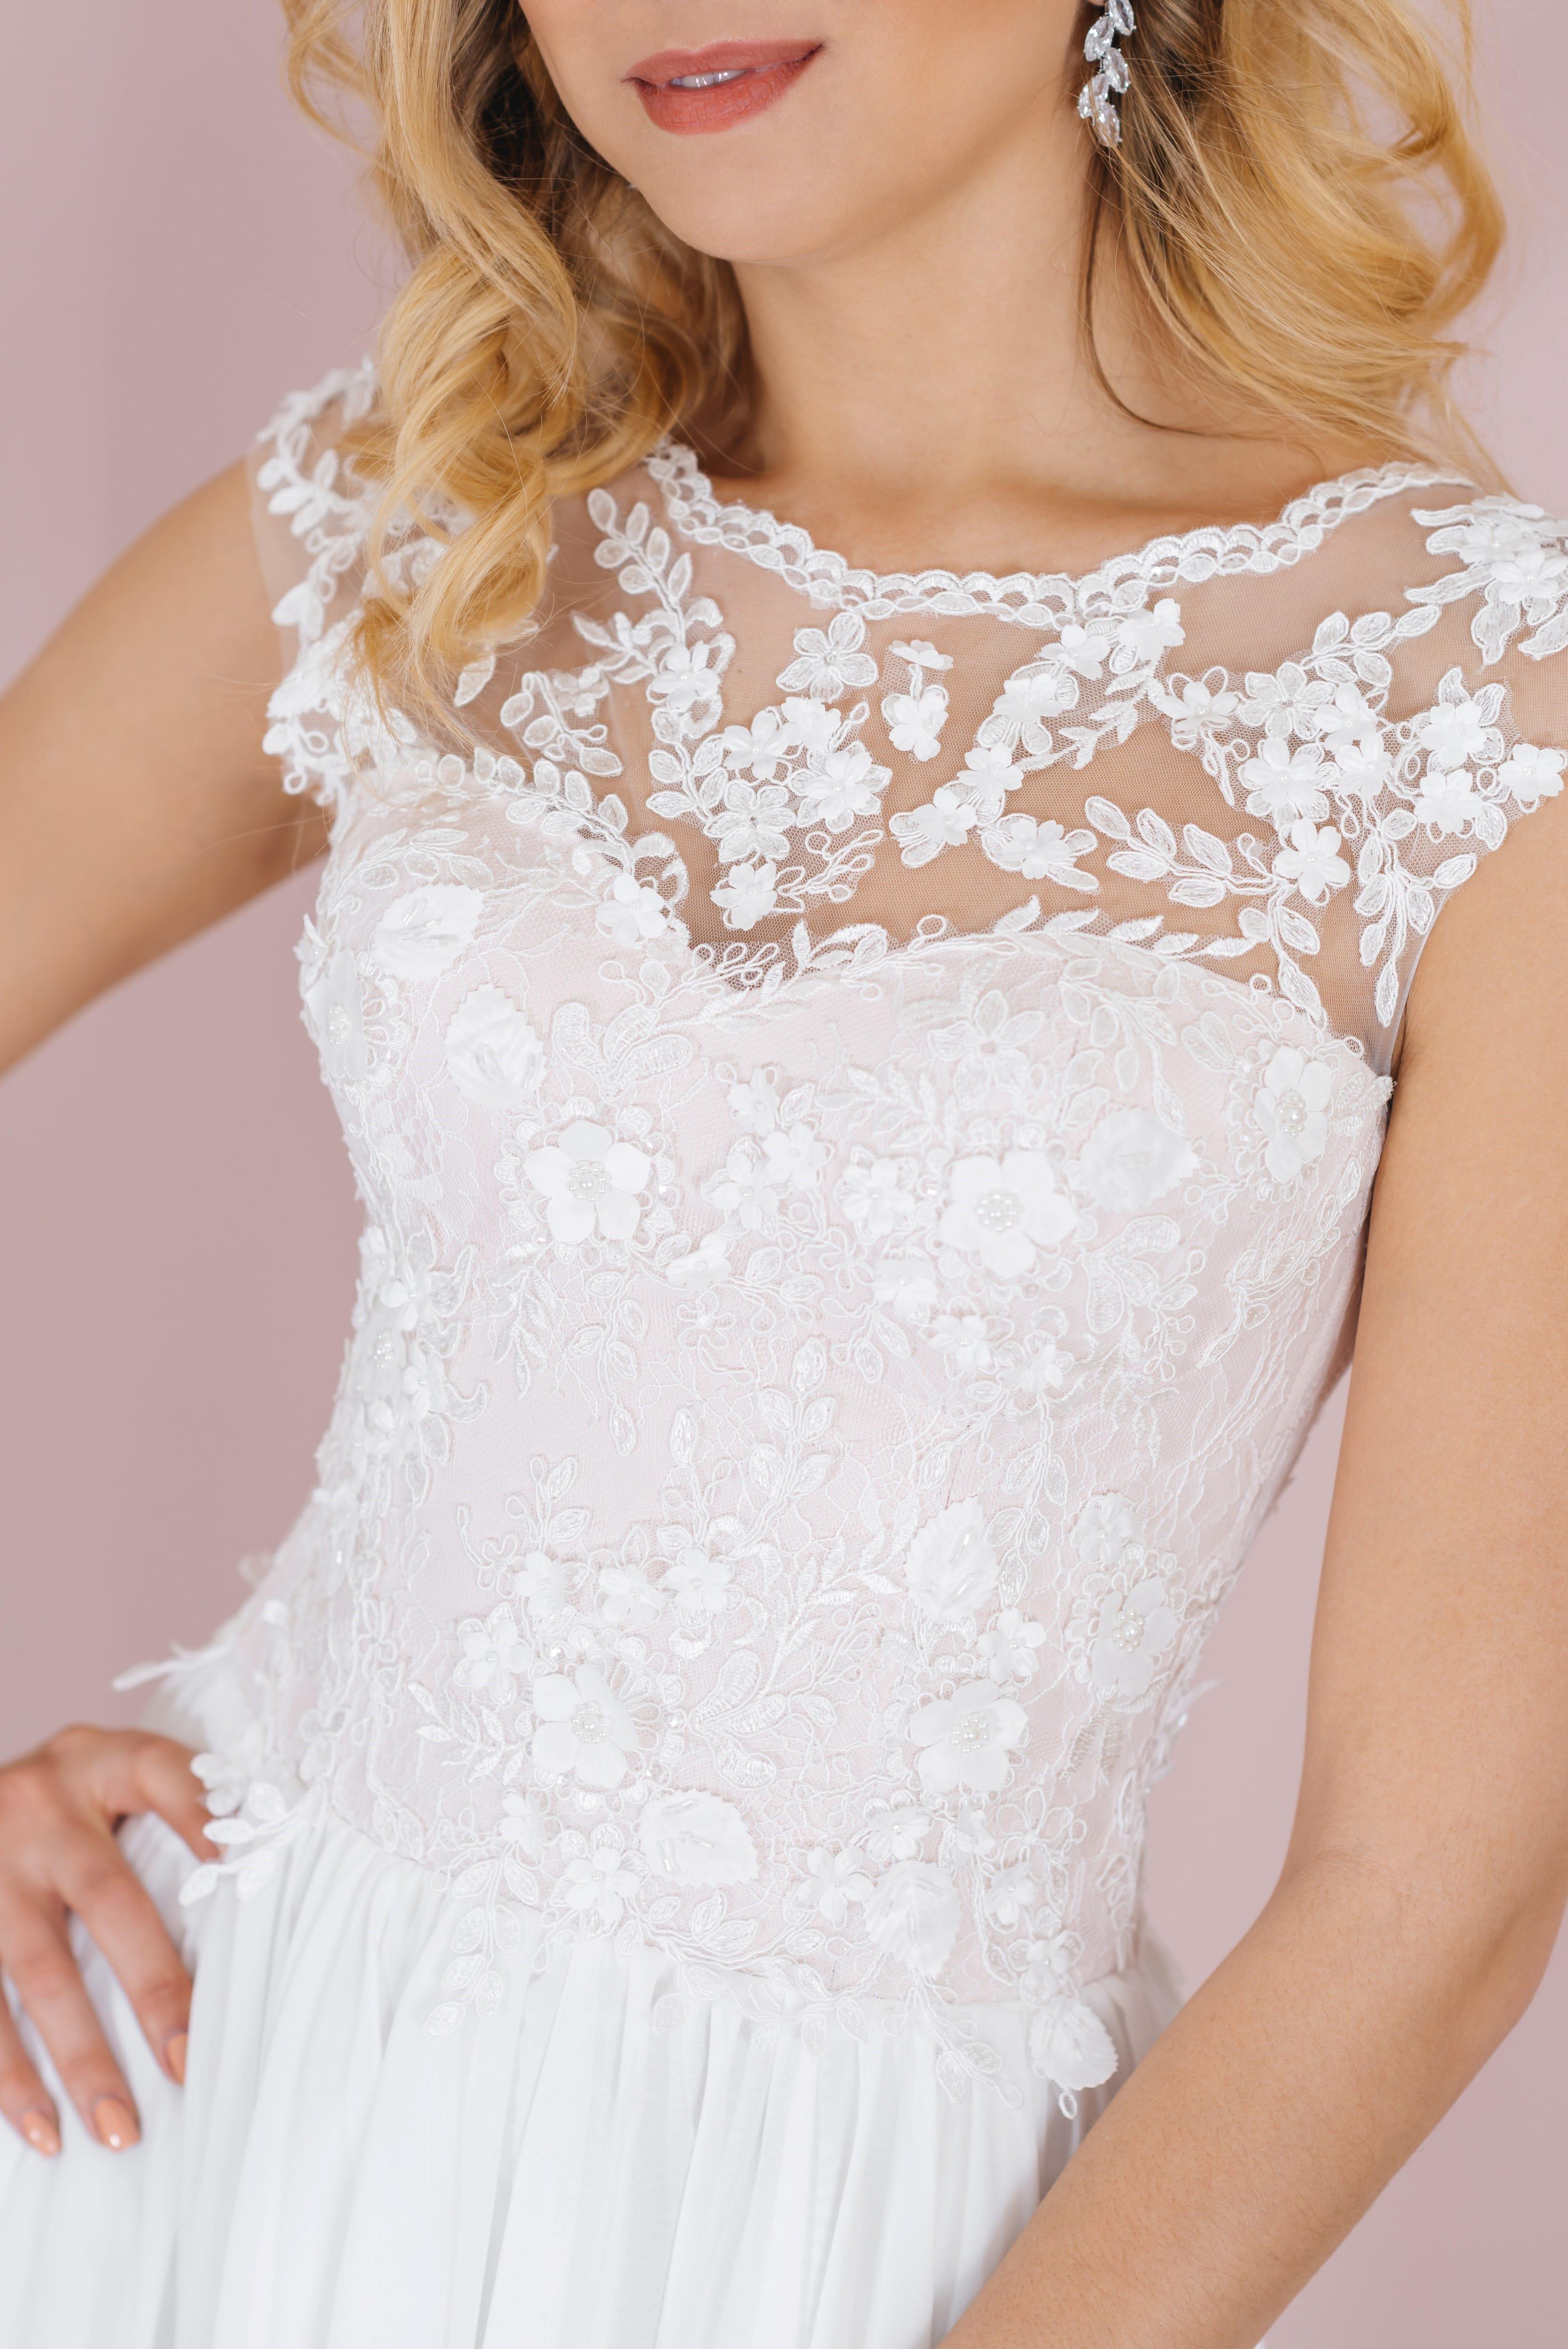 Свадебное платье SOPHIA, коллекция LOFT, бренд RARE BRIDAL, фото 4